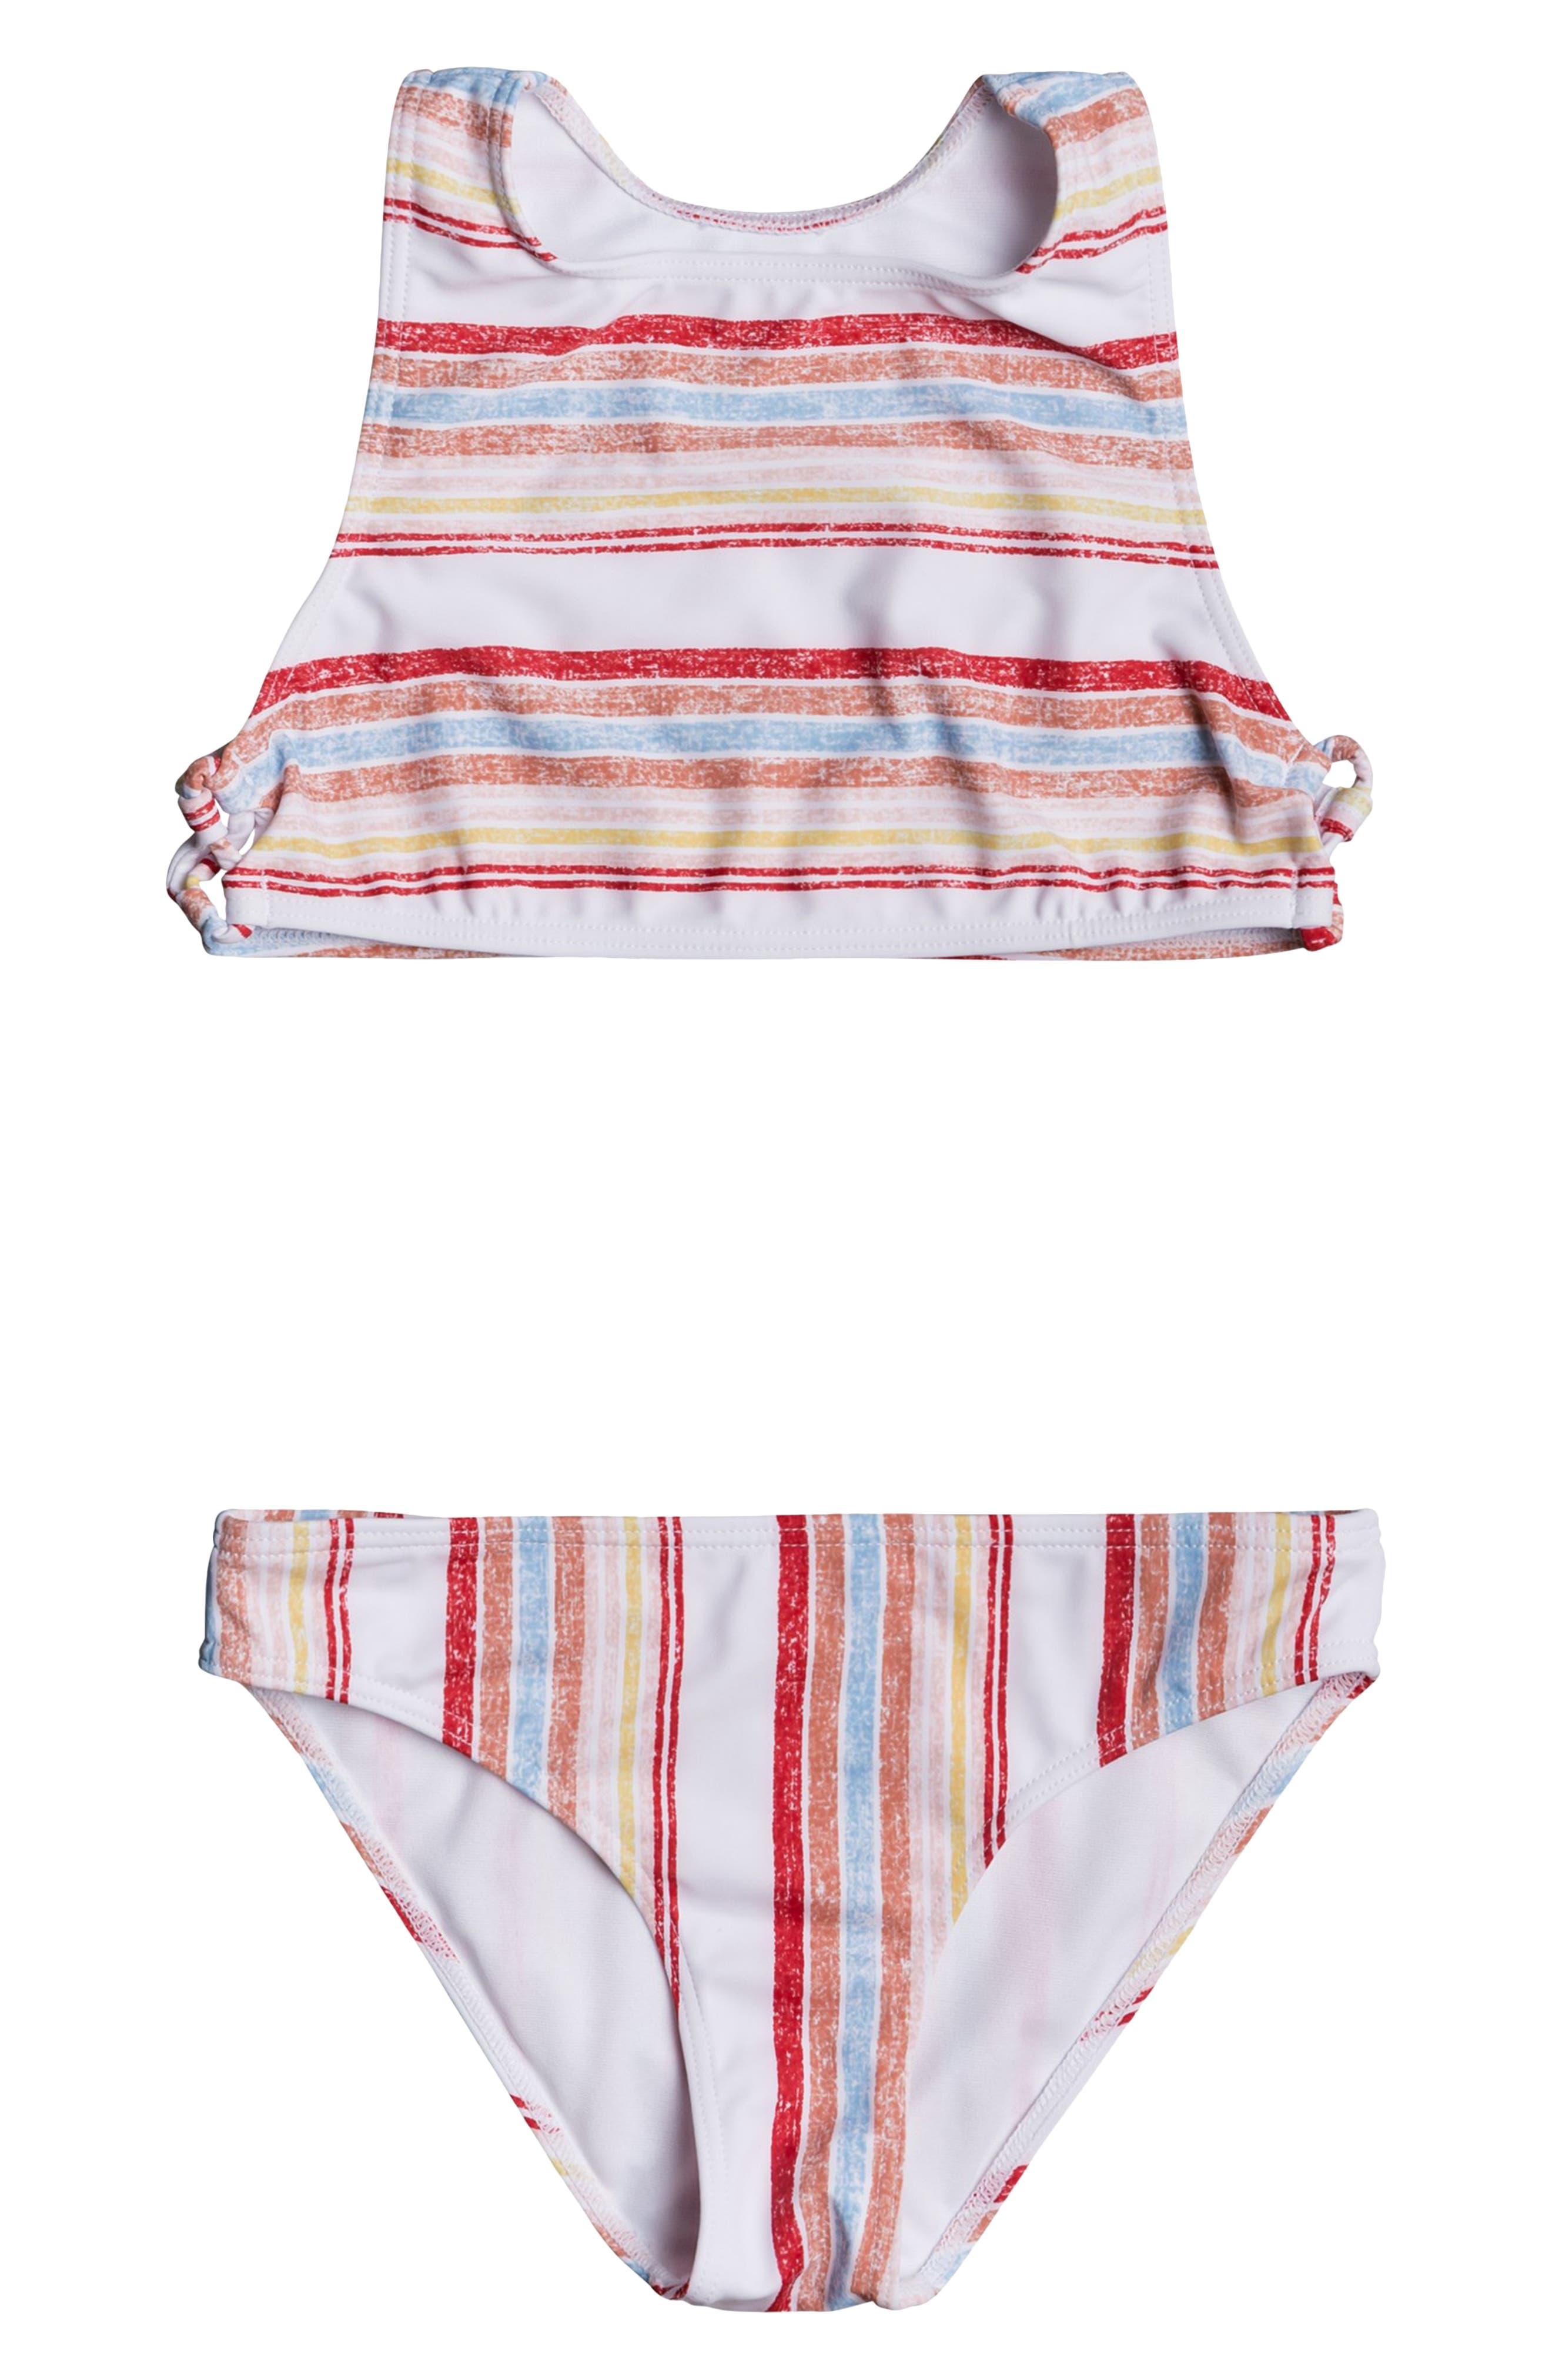 Image of Roxy Enjoying Waves Crop Top Bikini Set